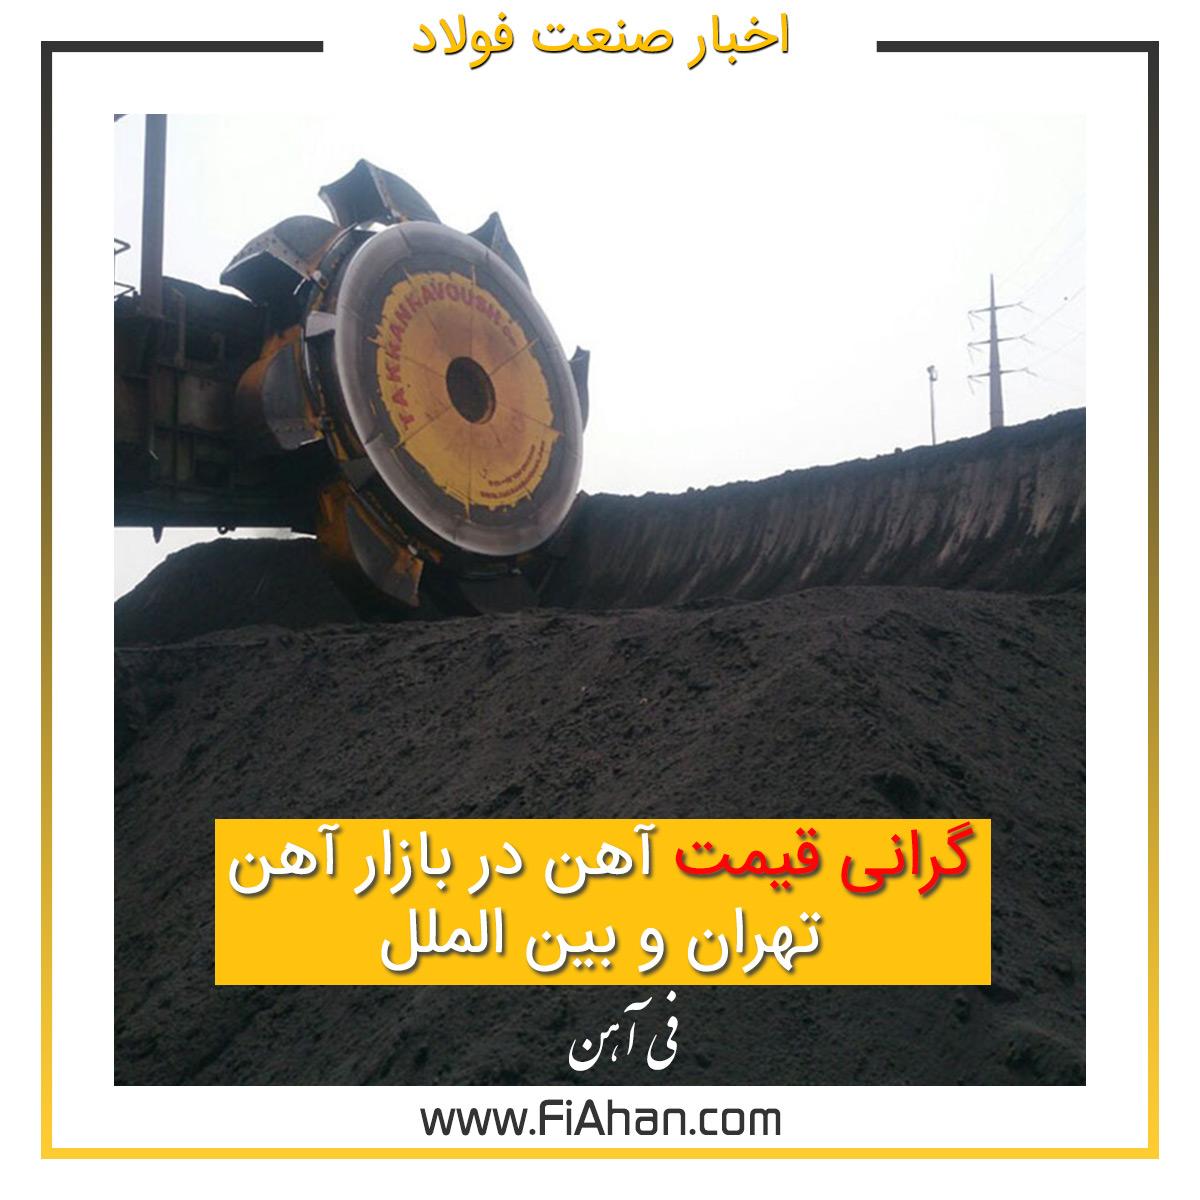 گرانی قیمت آهن در بازار آهن تهران و بین الملل